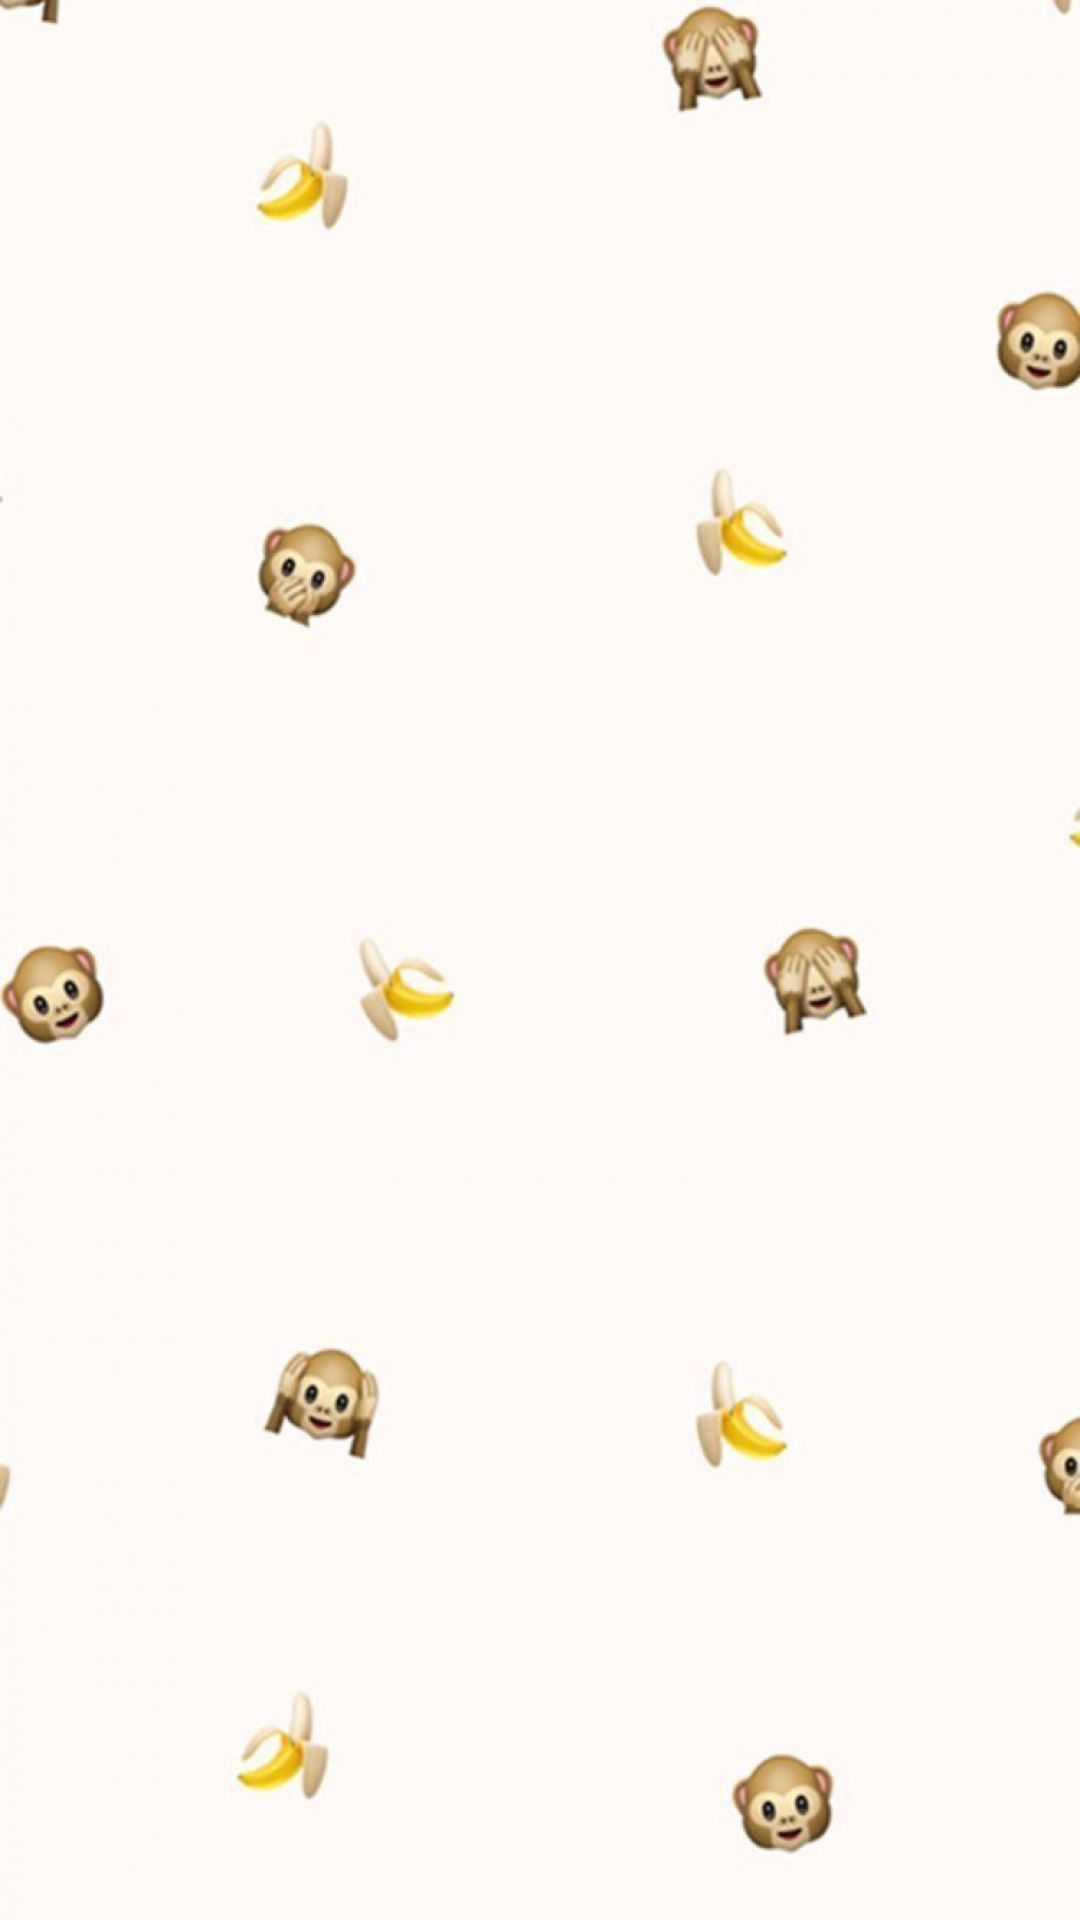 Aesthetic Wallpaper Emoji Iphone 3176717 Hd Wallpaper Backgrounds Download